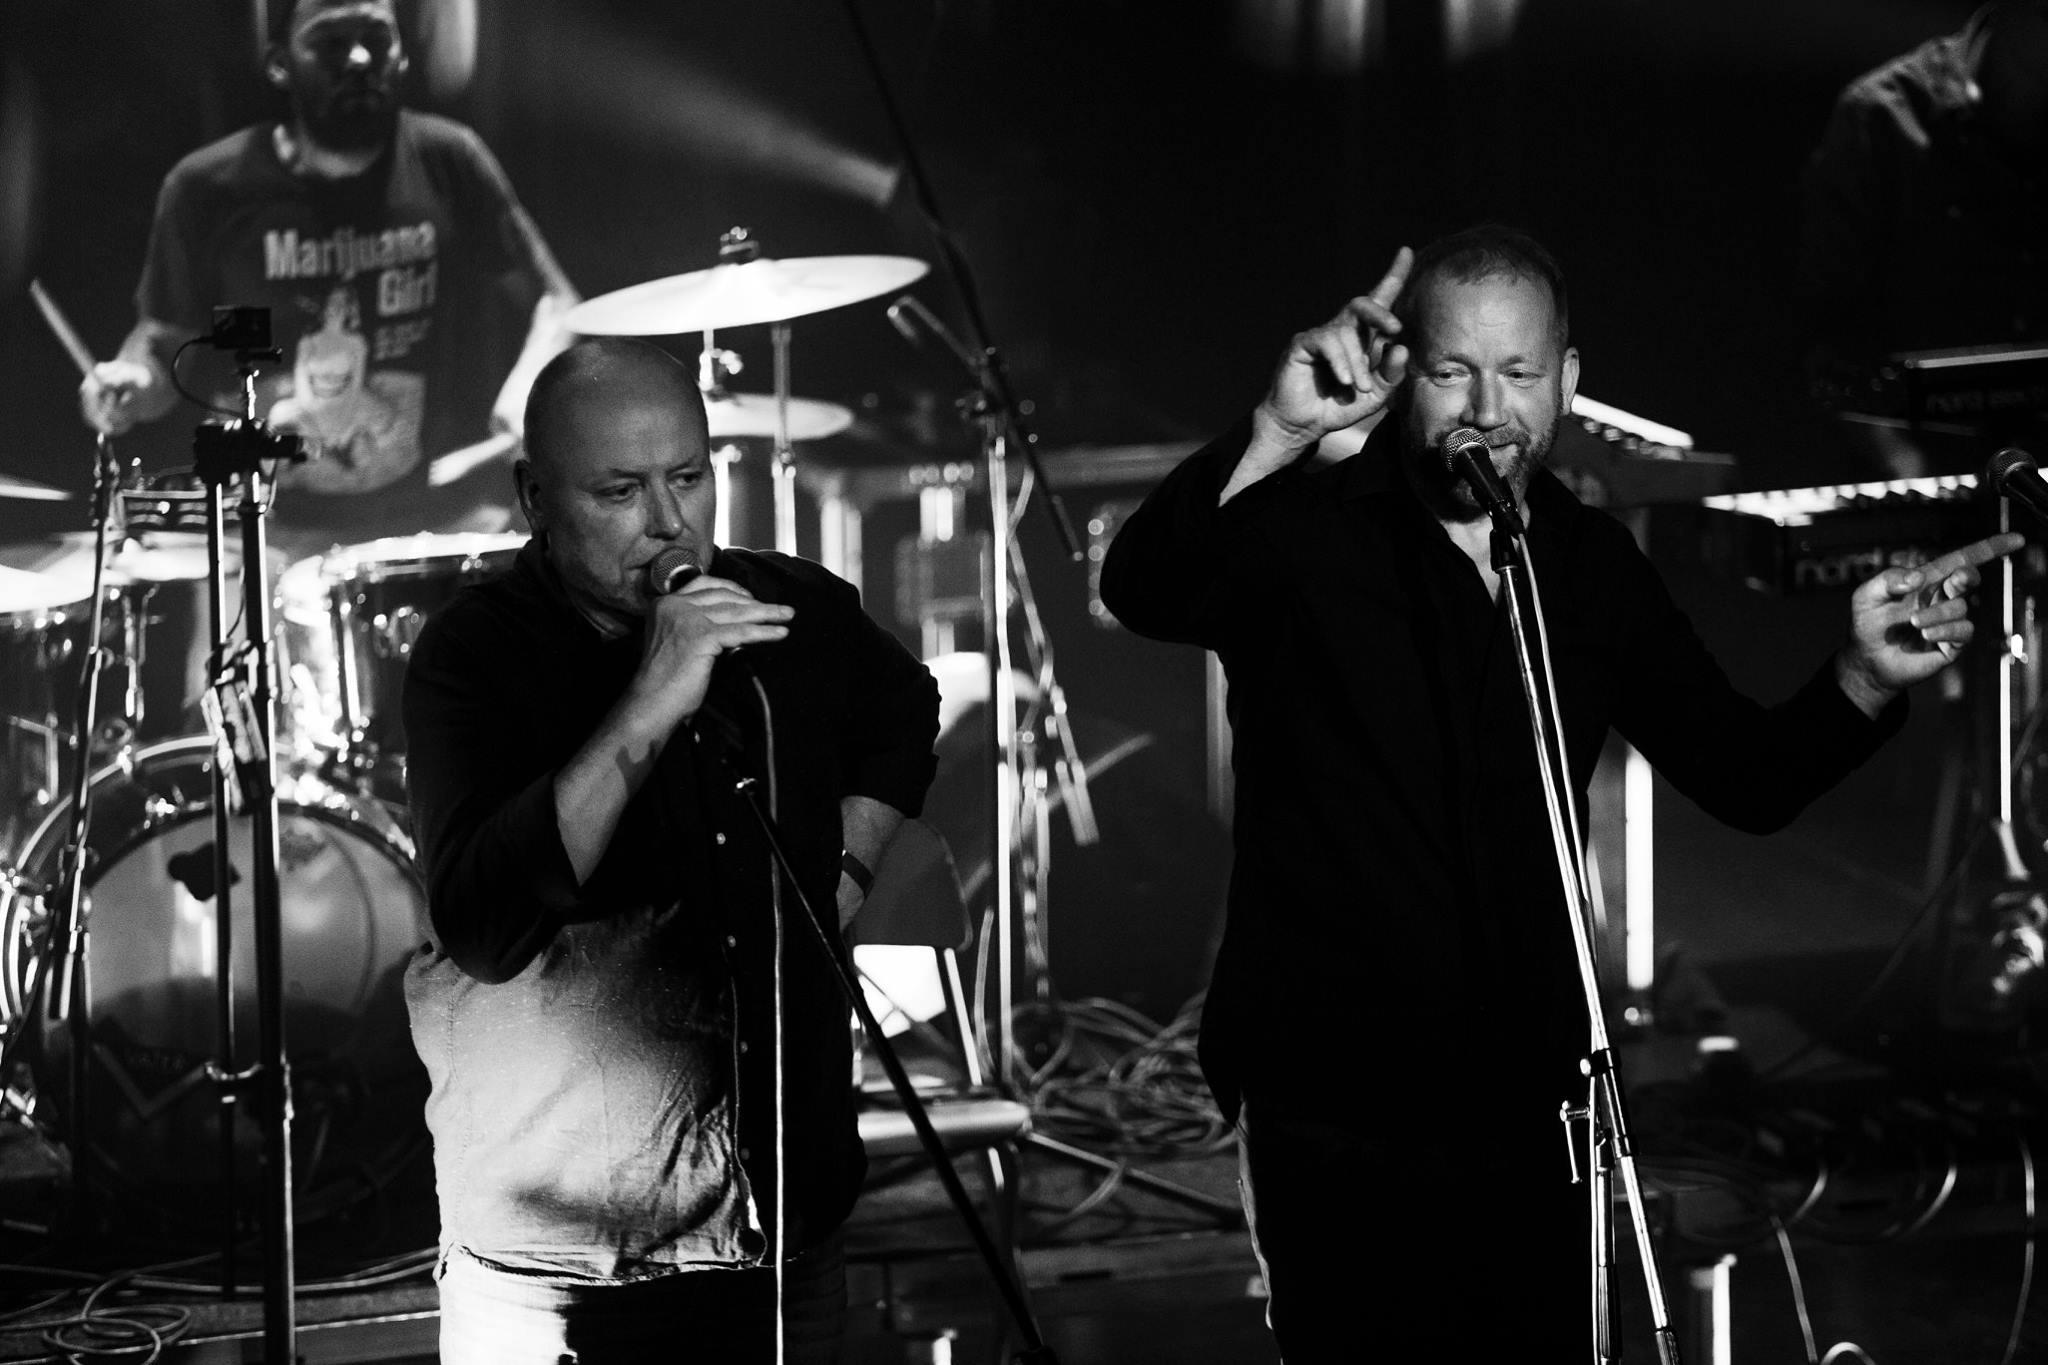 Michal Ambrož, David Koller & Hudba Praha